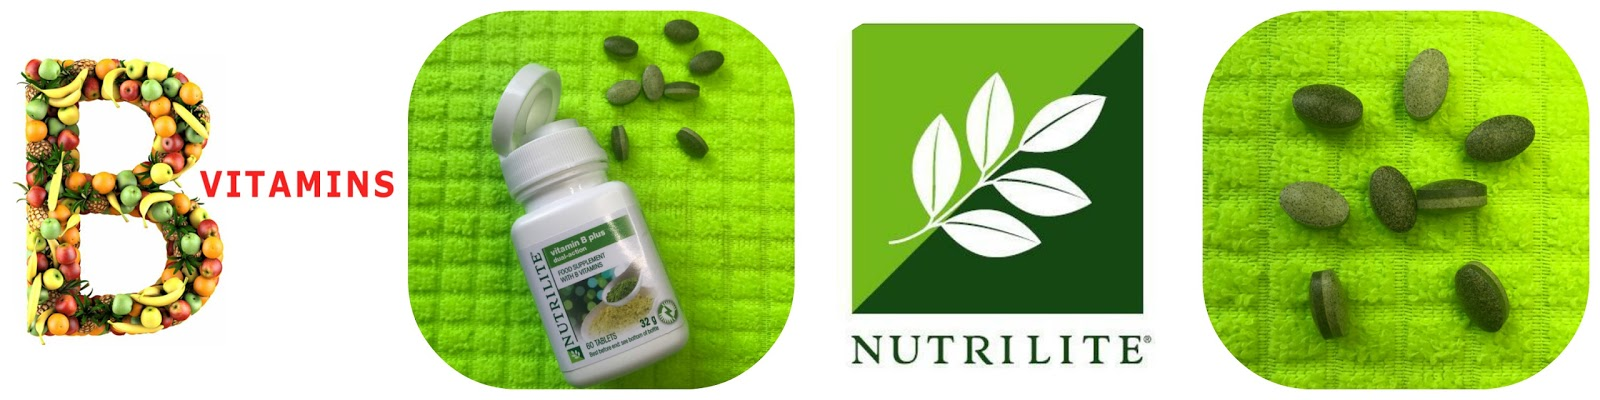 Nutrilite Vitamin B Plus Review